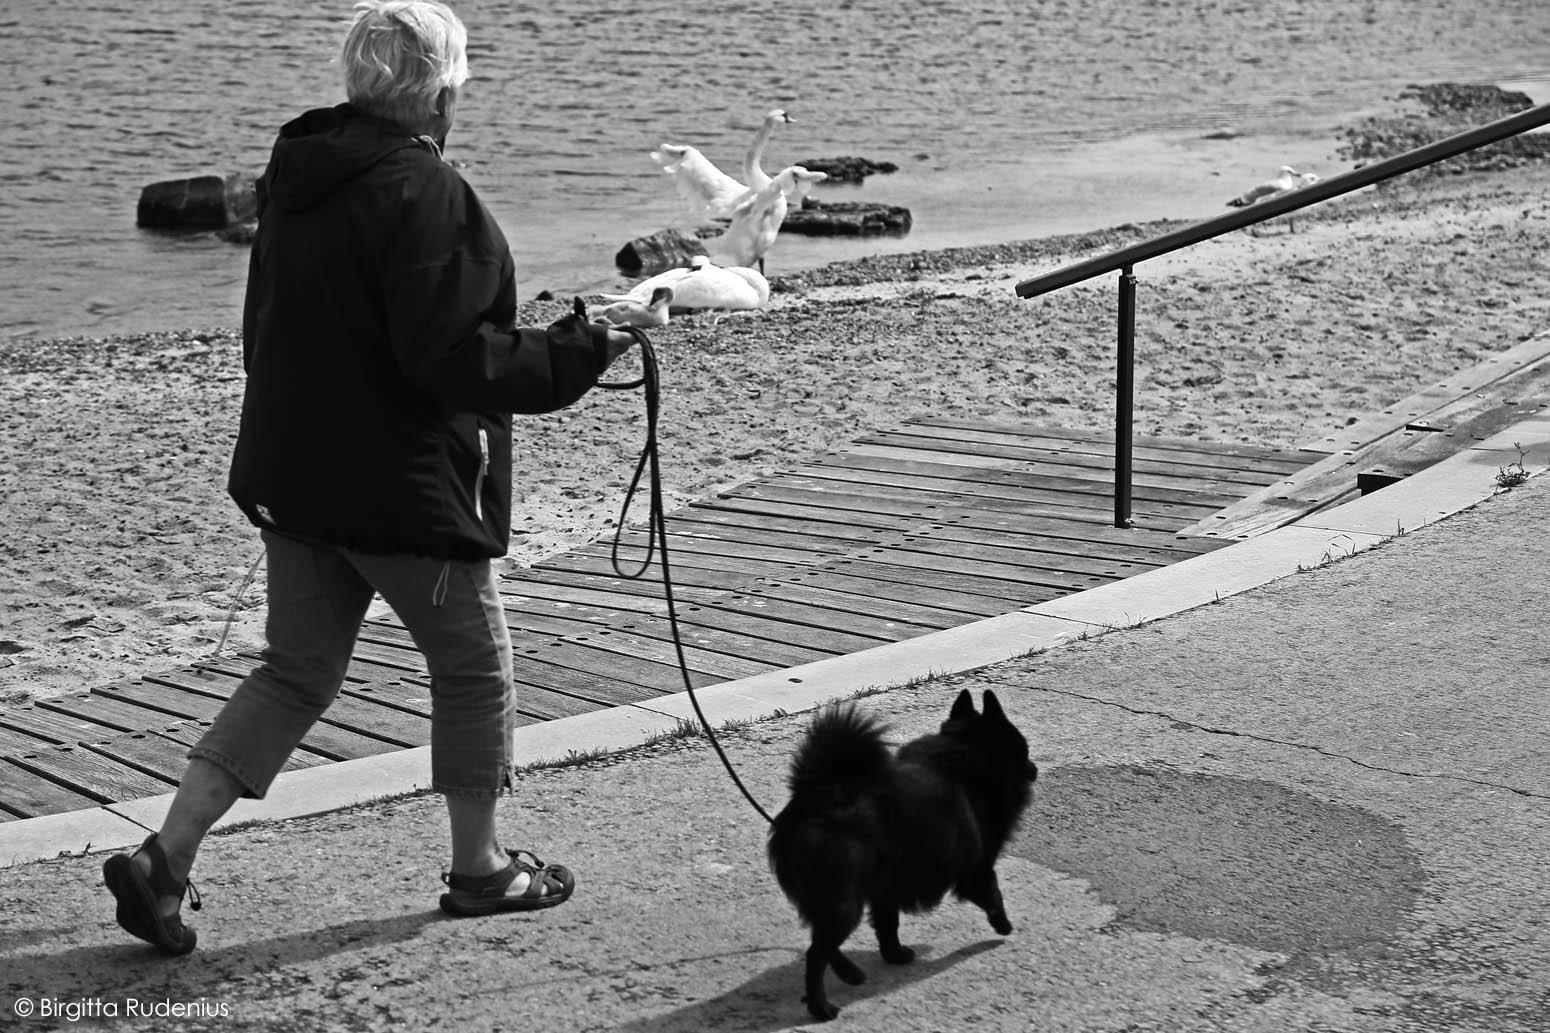 White swan & Black dog © Birgitta Rudenius